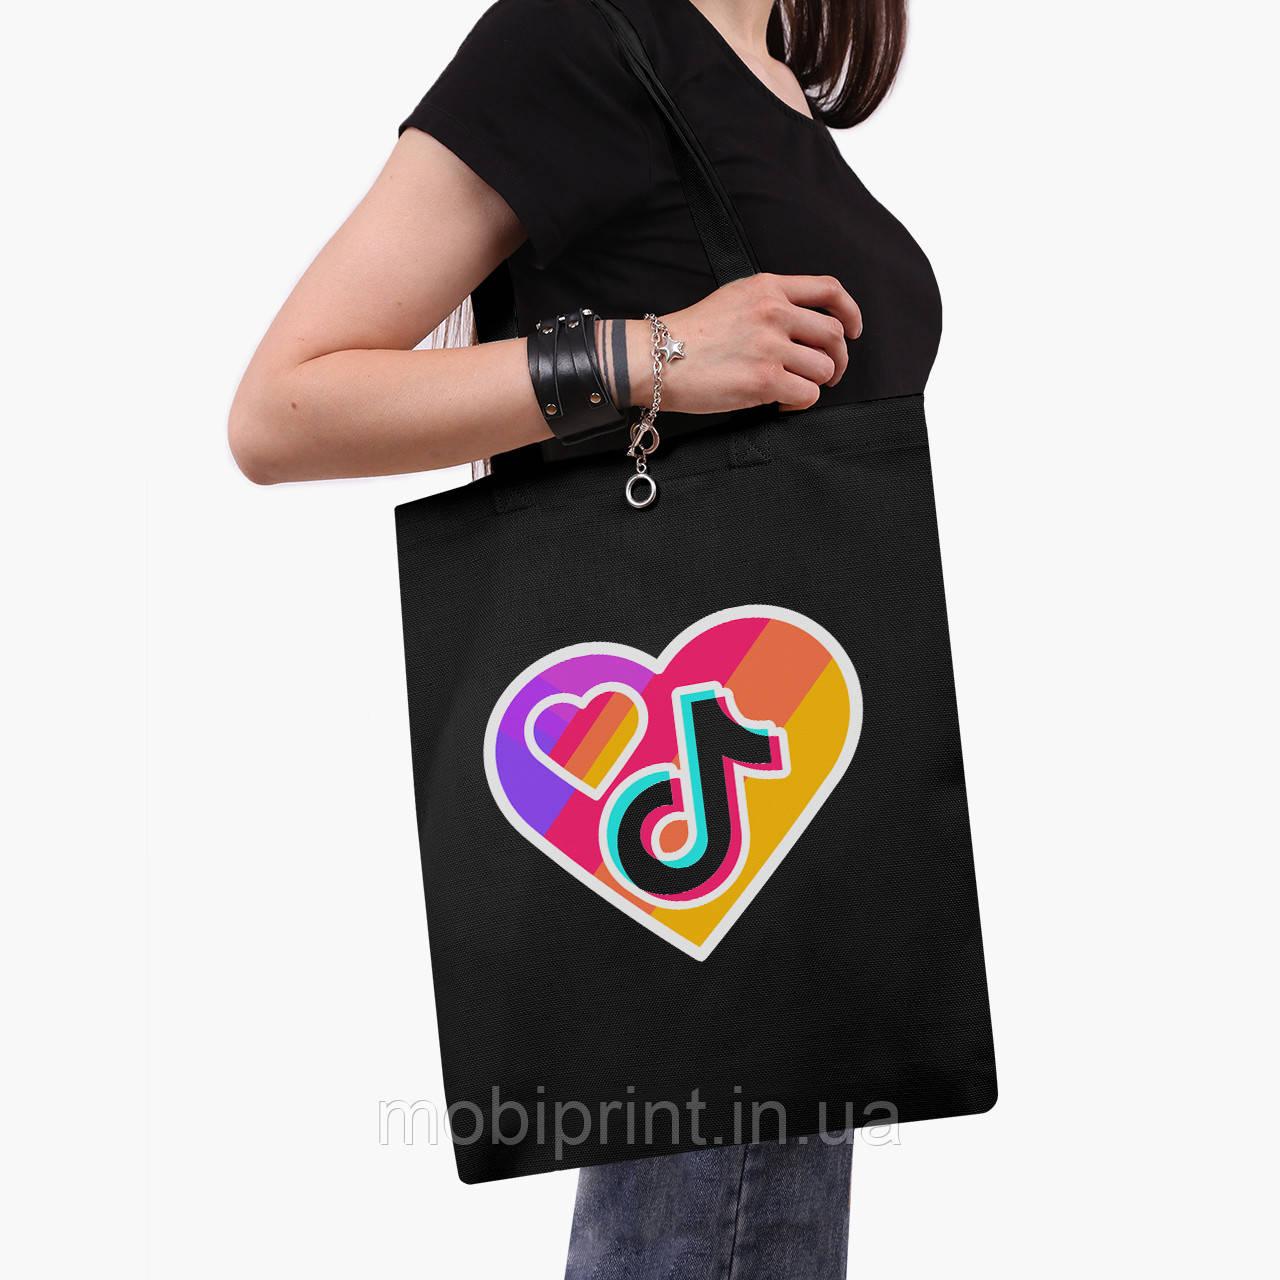 Эко сумка шоппер черная ТикТок (TikTok) (9227-1559-2)  41*35 см